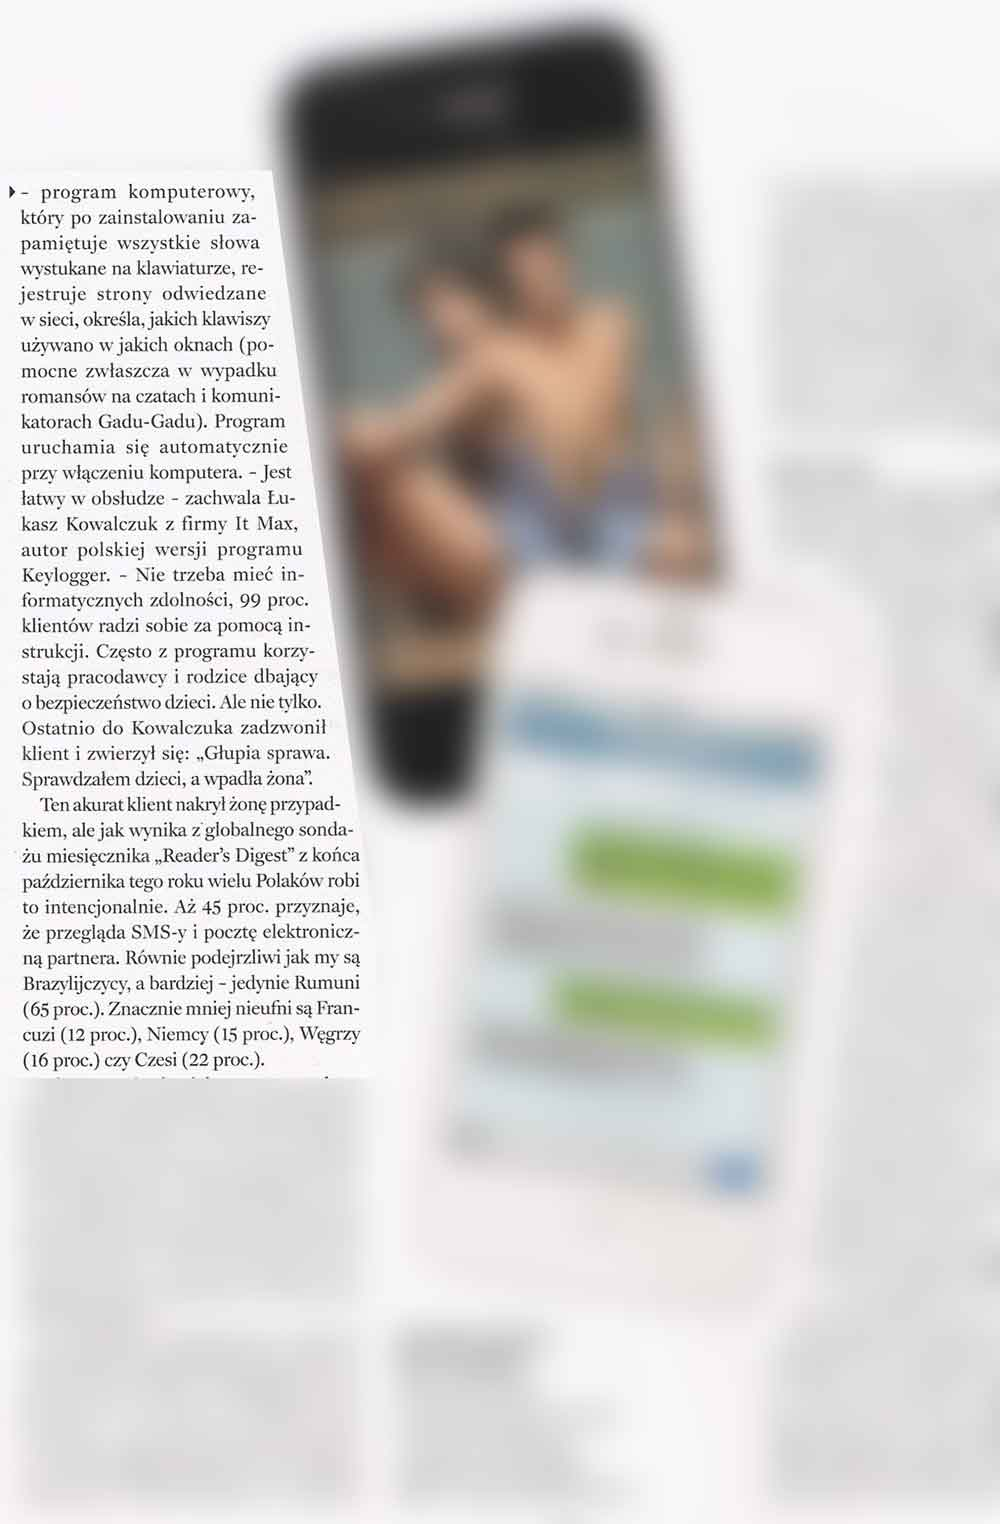 Artykuł Newsweek Polska